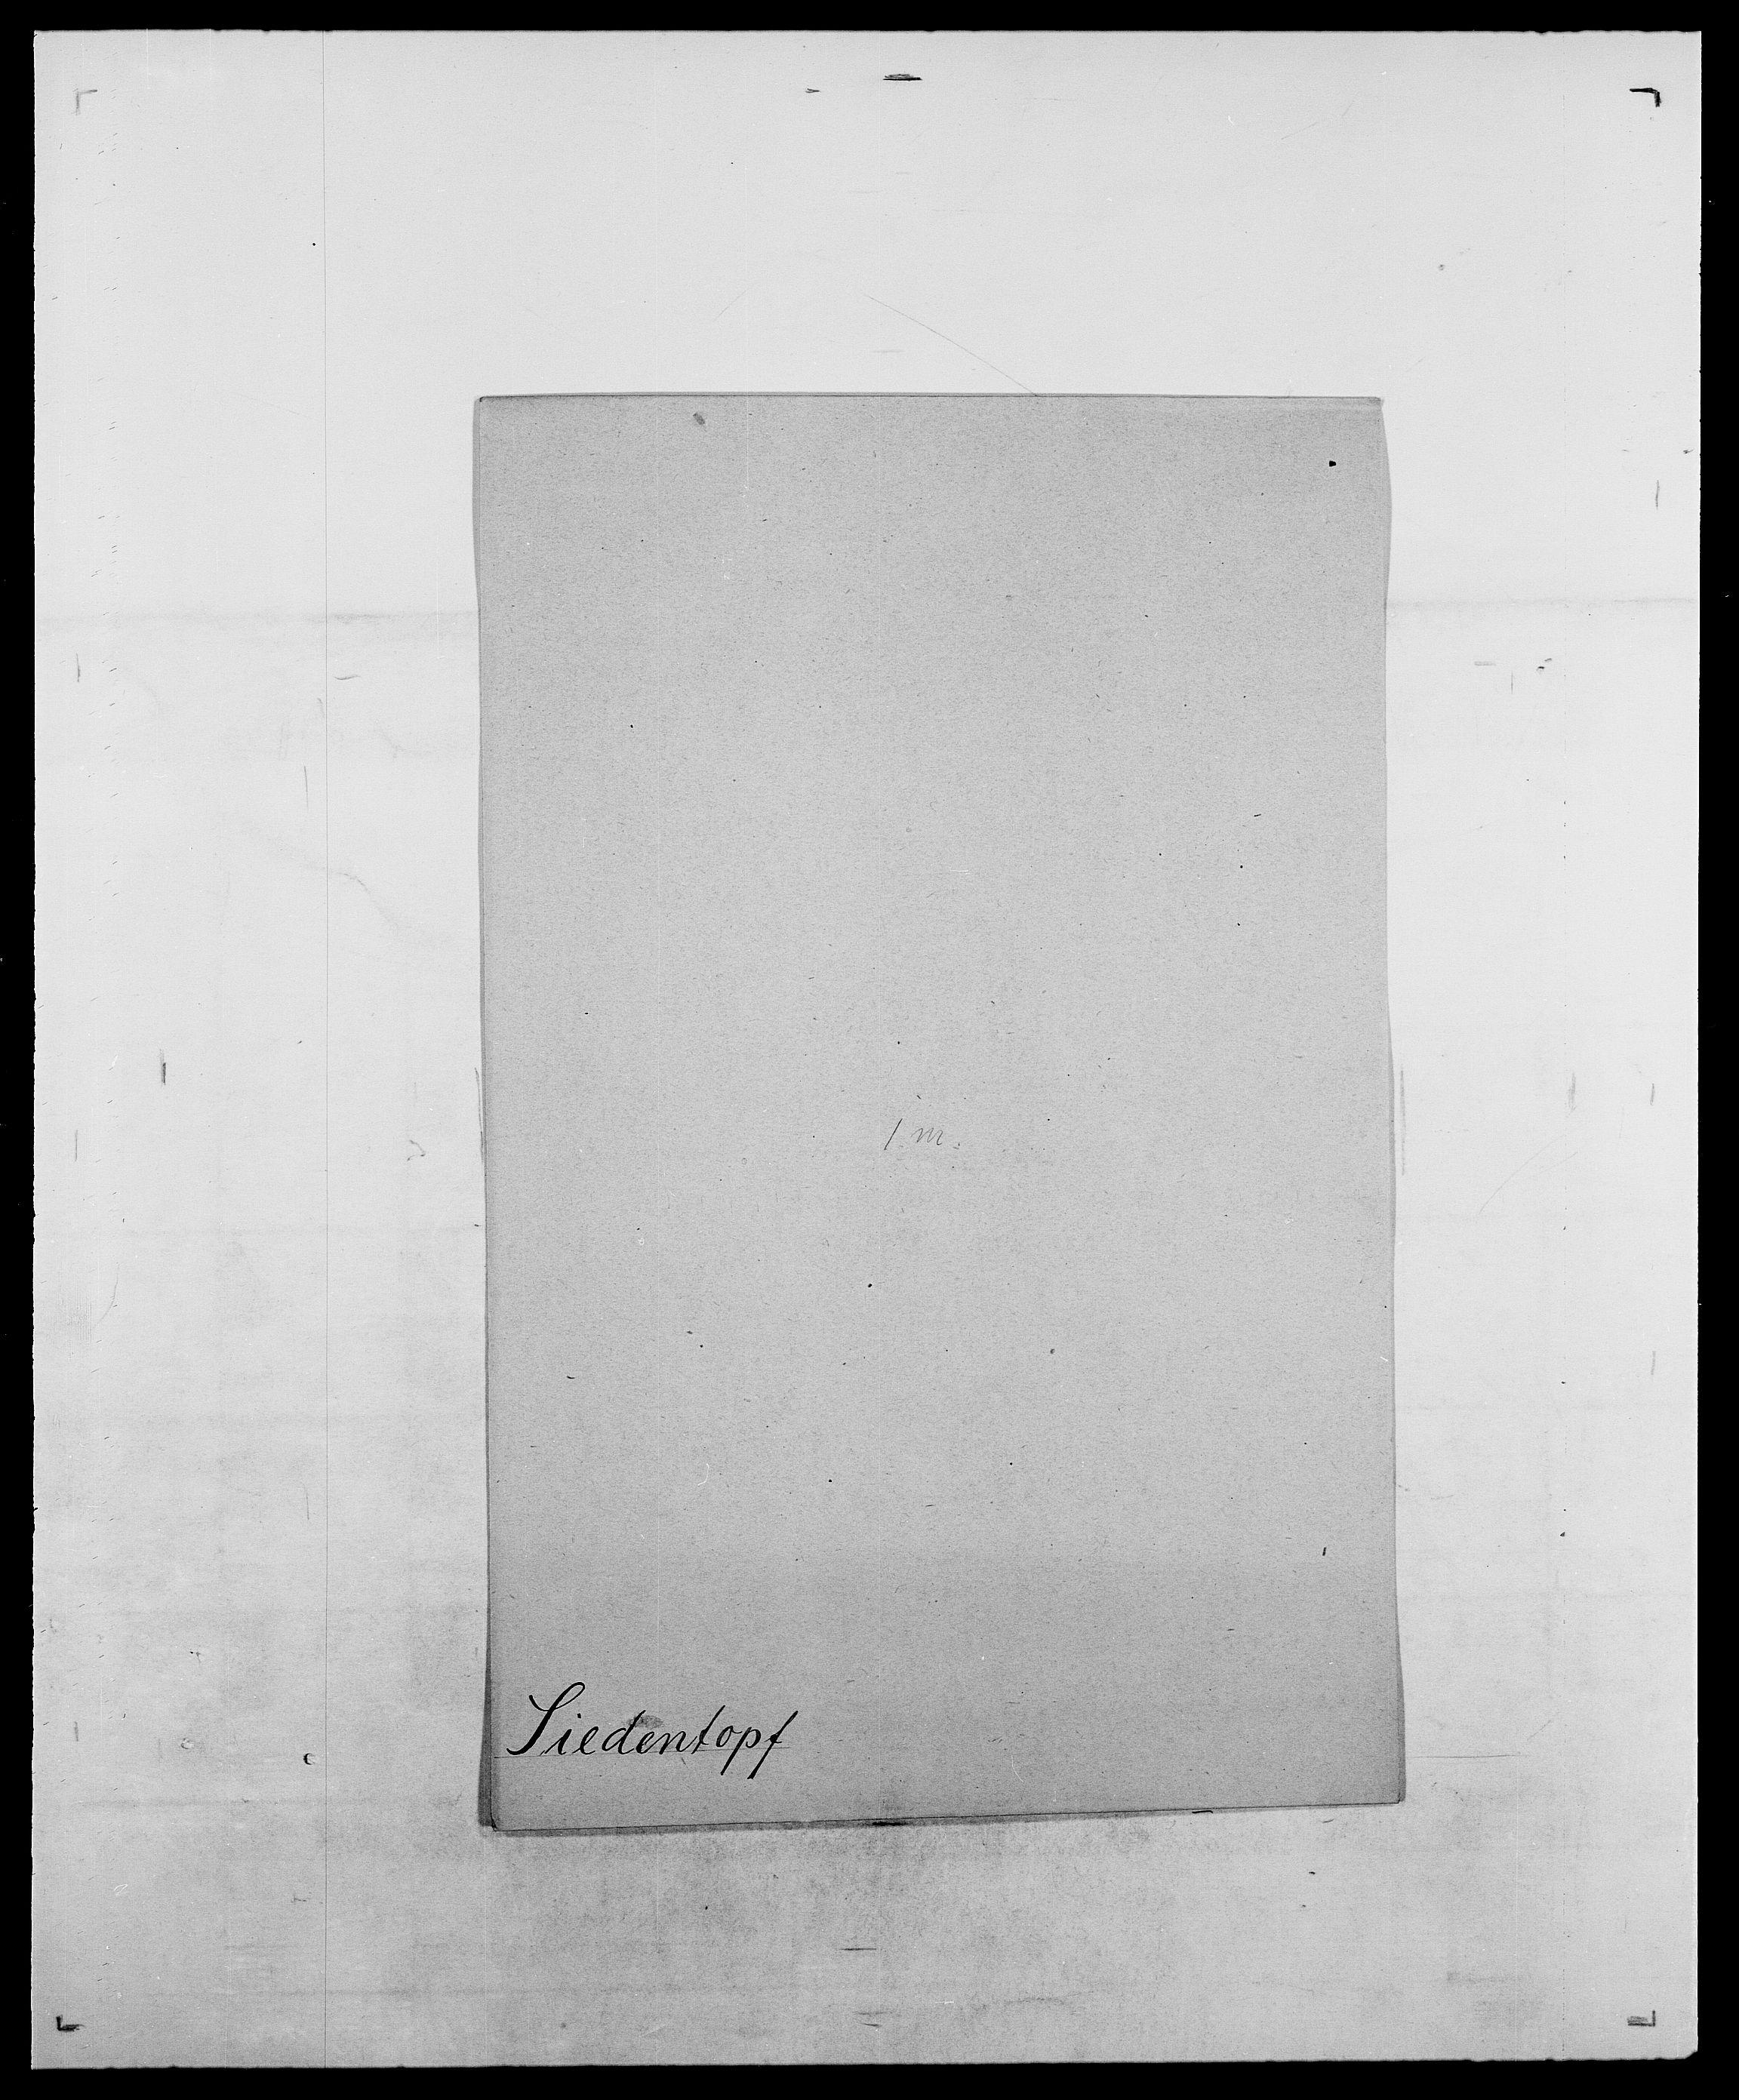 SAO, Delgobe, Charles Antoine - samling, D/Da/L0035: Schnabel - sjetman, s. 765